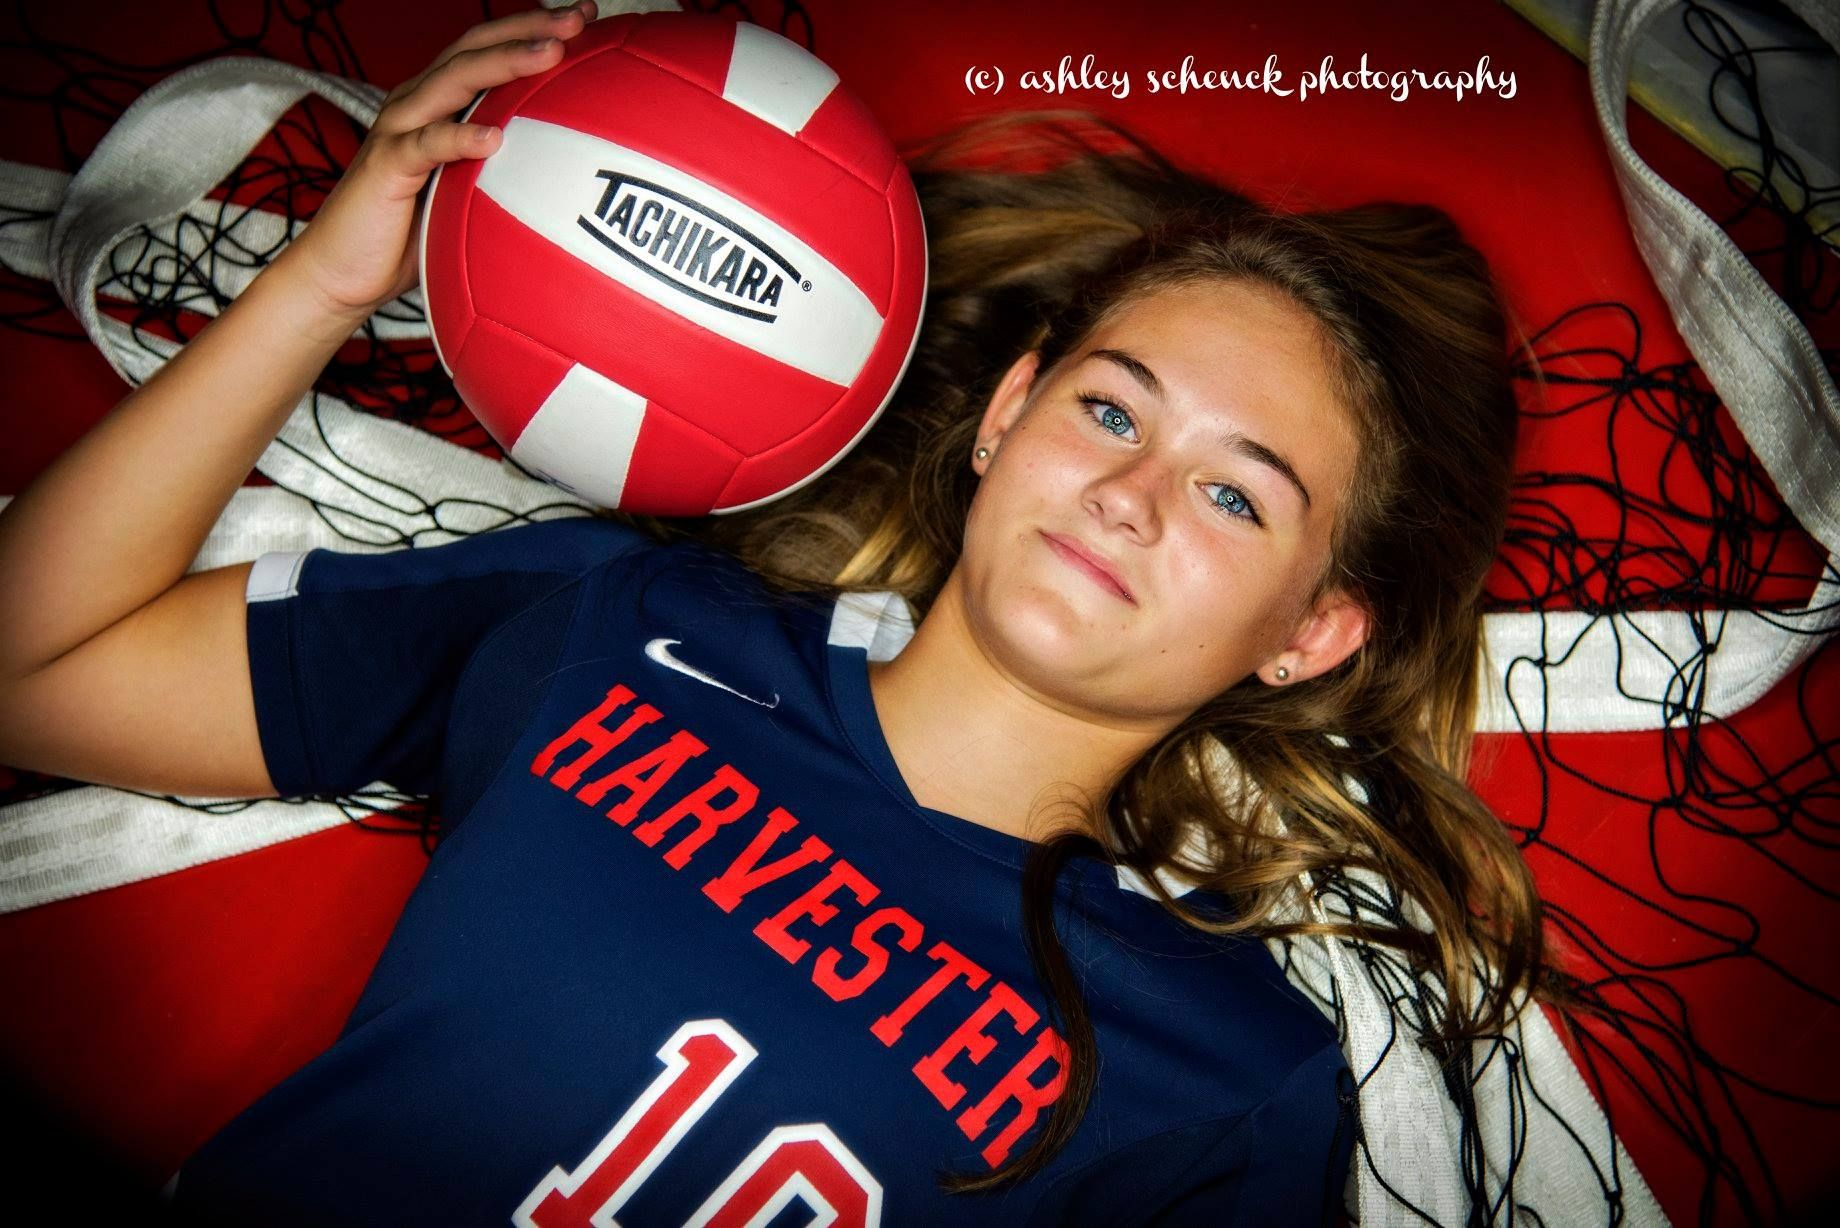 Volleyball Volleyball Photography Photography Volleyball